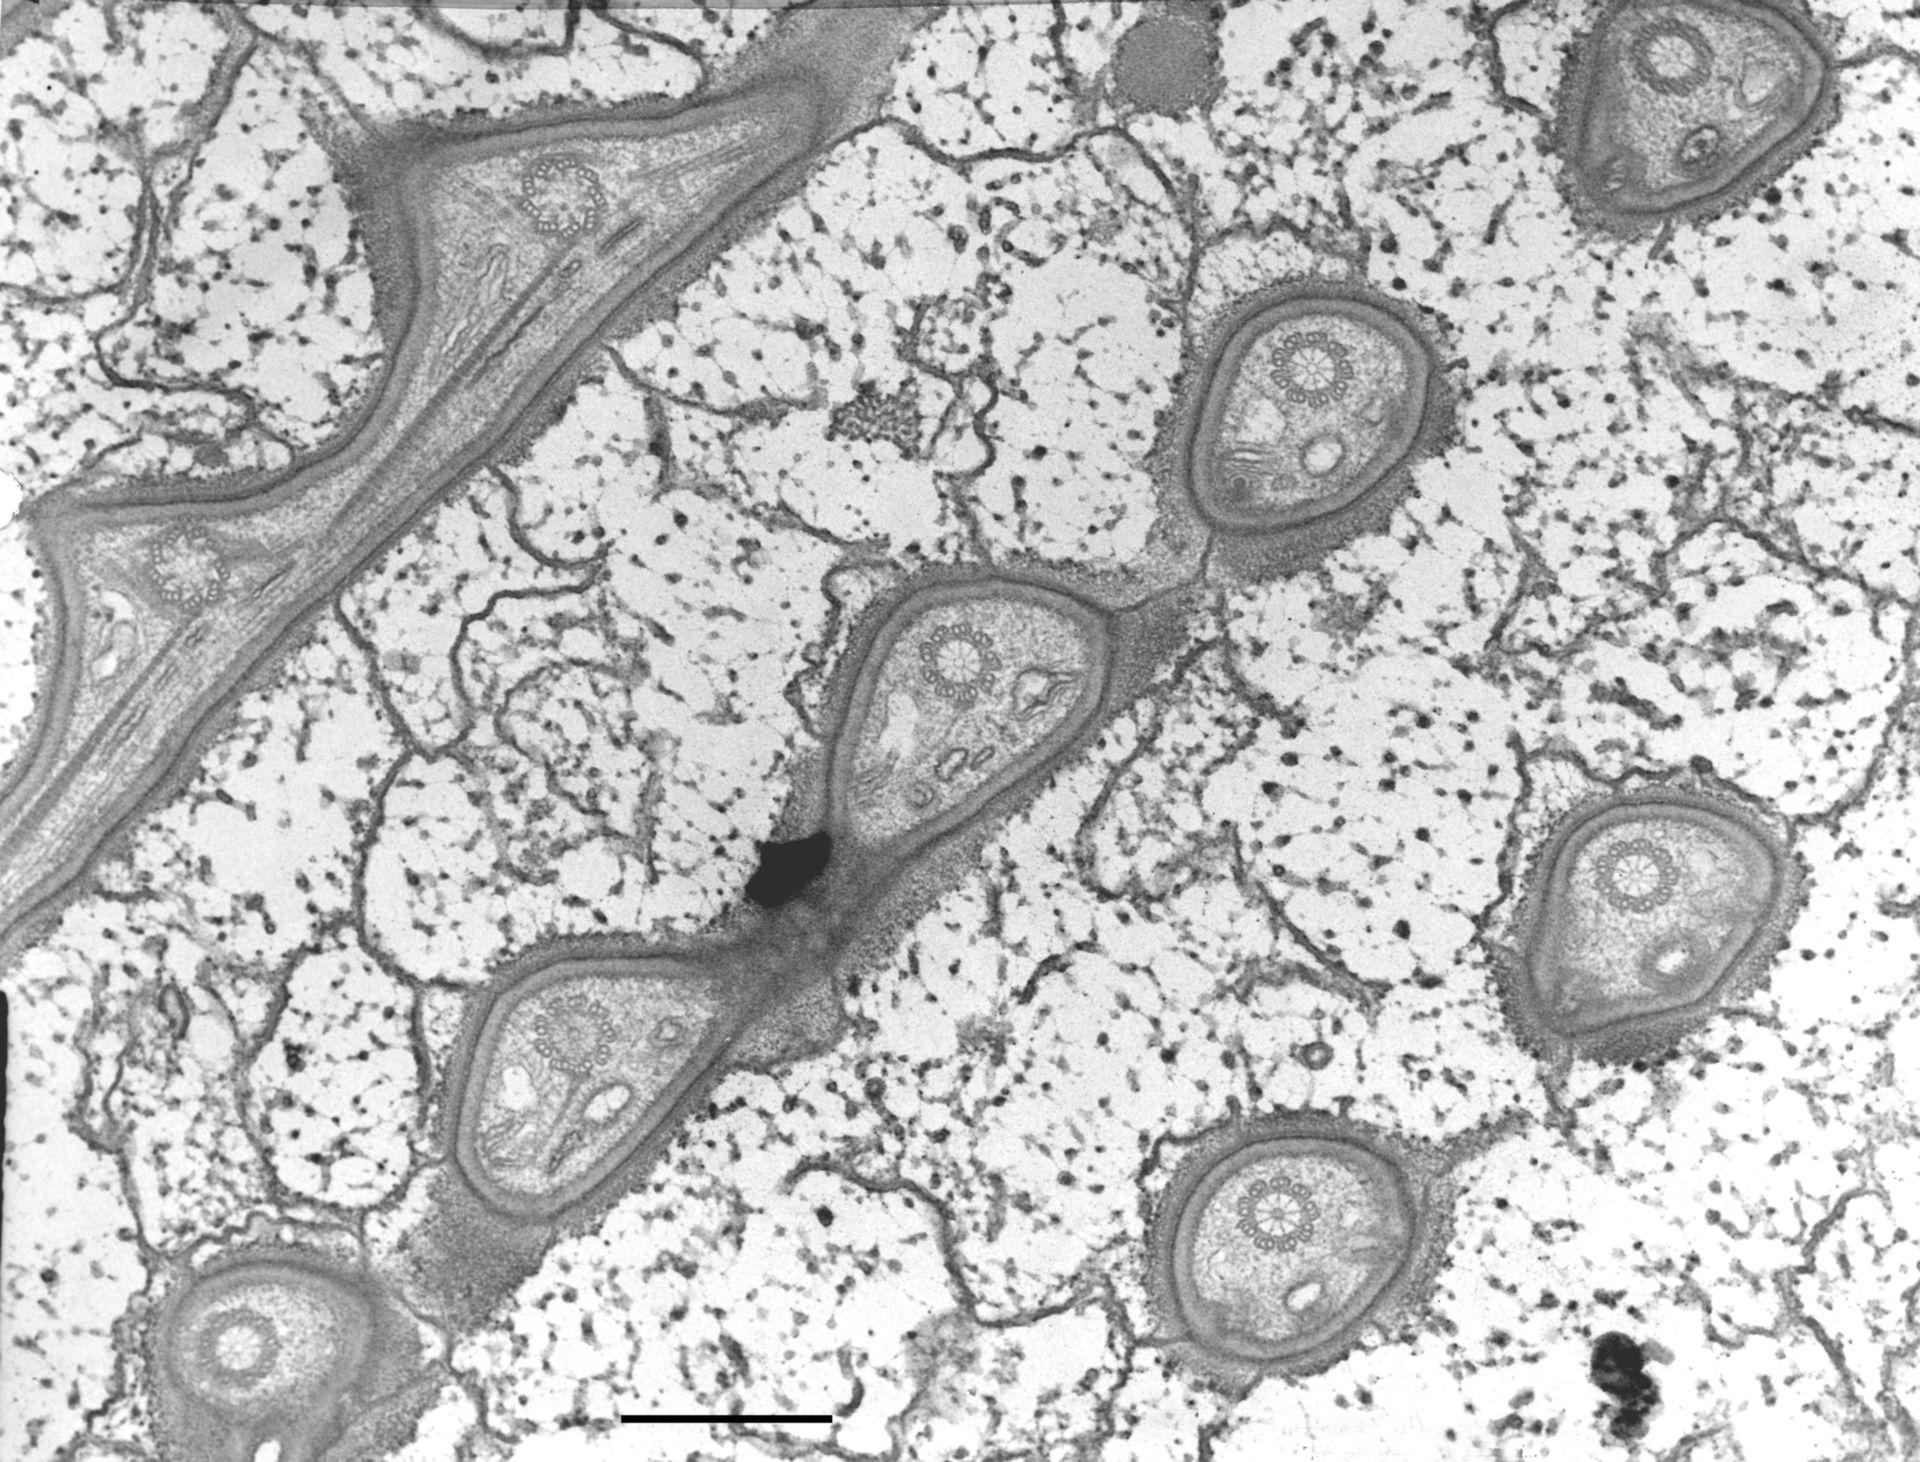 Nassula (Cytoskeleton) - CIL:10370